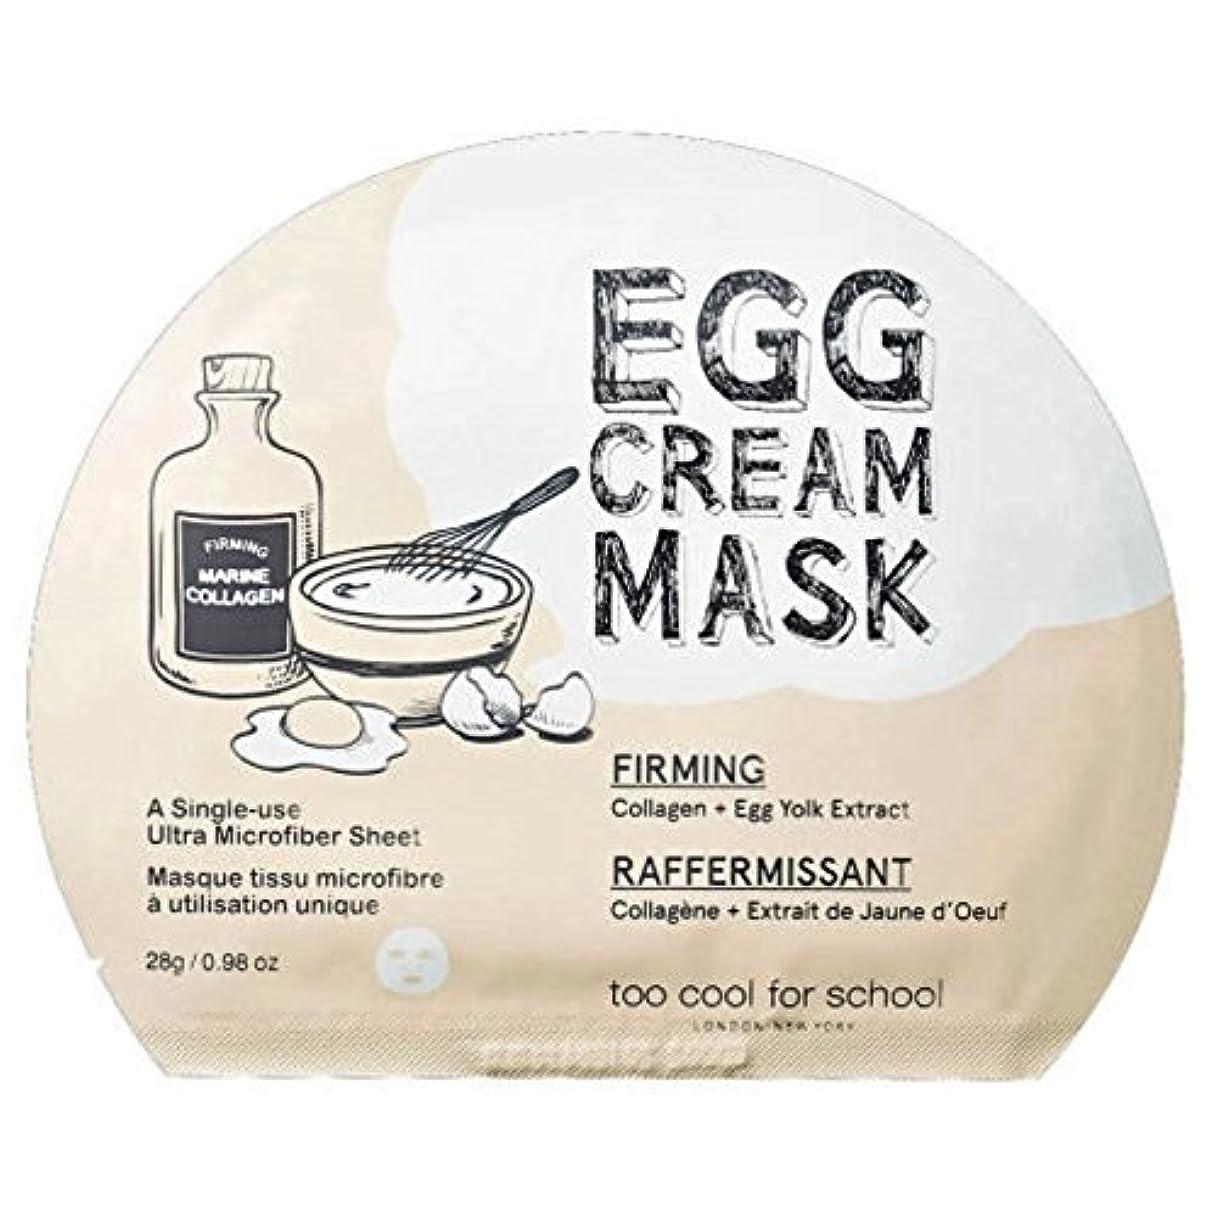 [New] too cool for school Egg Cream Mask (Firming) 28g × 5ea/トゥークール フォースクール エッグ クリーム マスク (ファーミング) 28g × 5枚